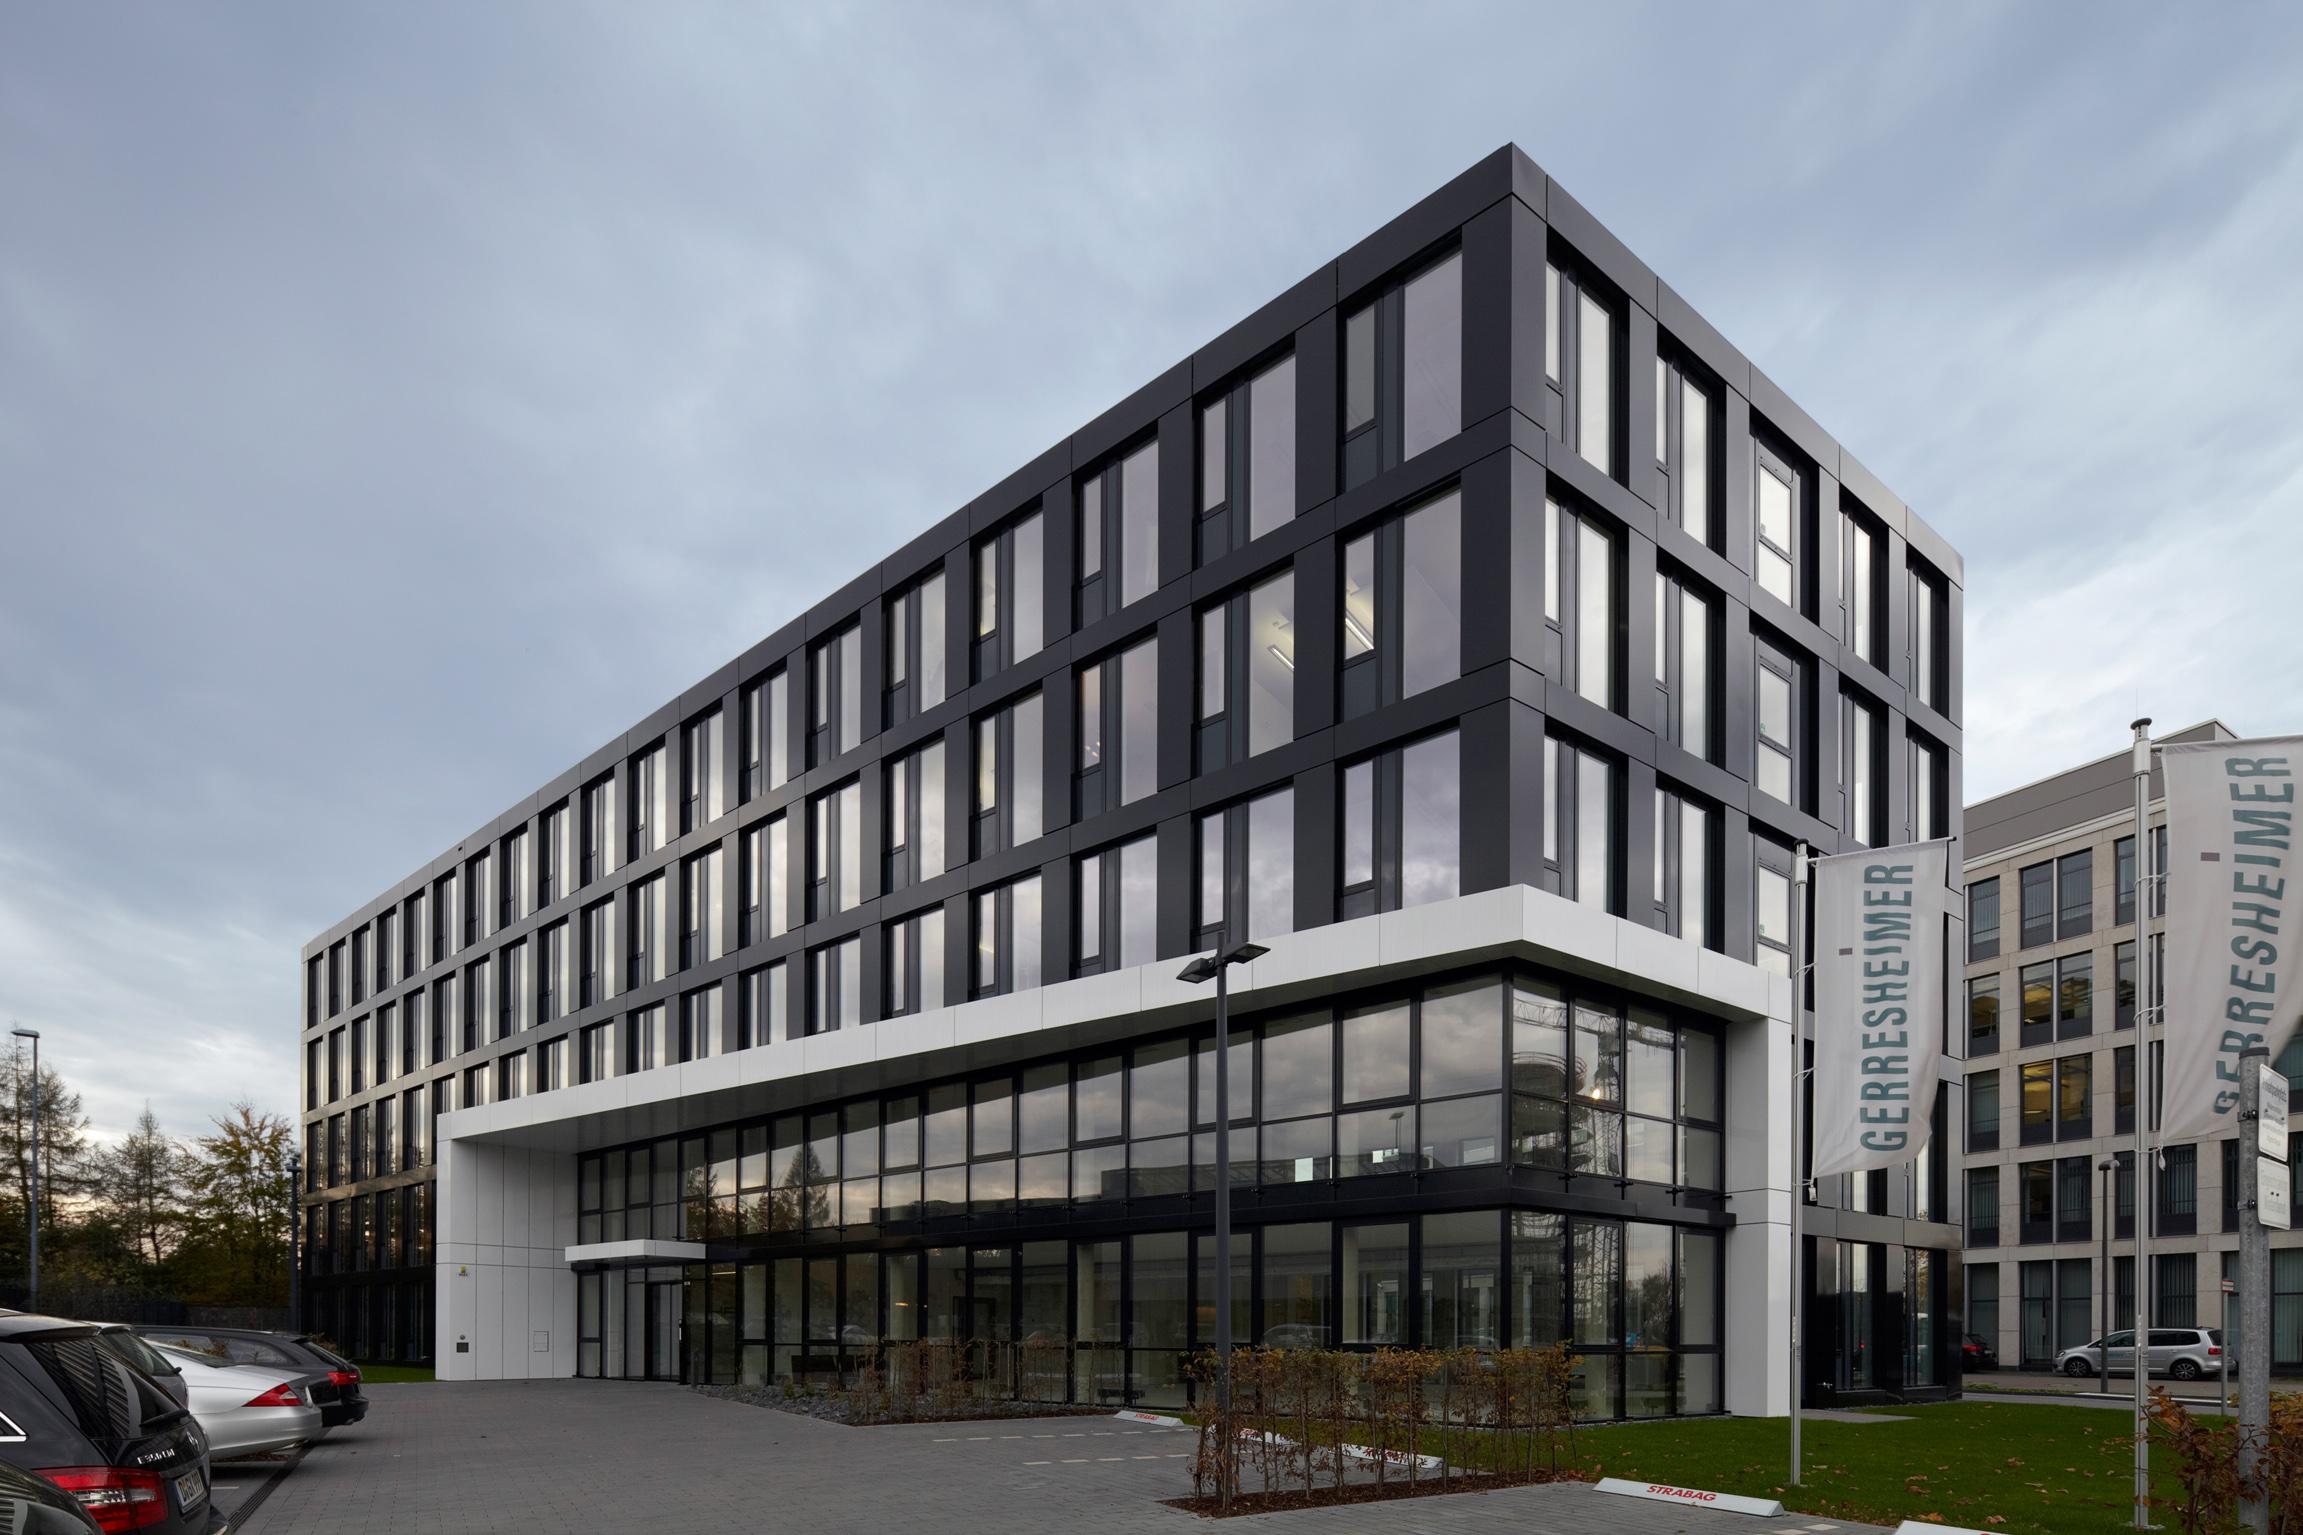 Fassade bürogebäude  Bürofassade | Office | Pinterest | Bürogebäude, Düsseldorf und ...